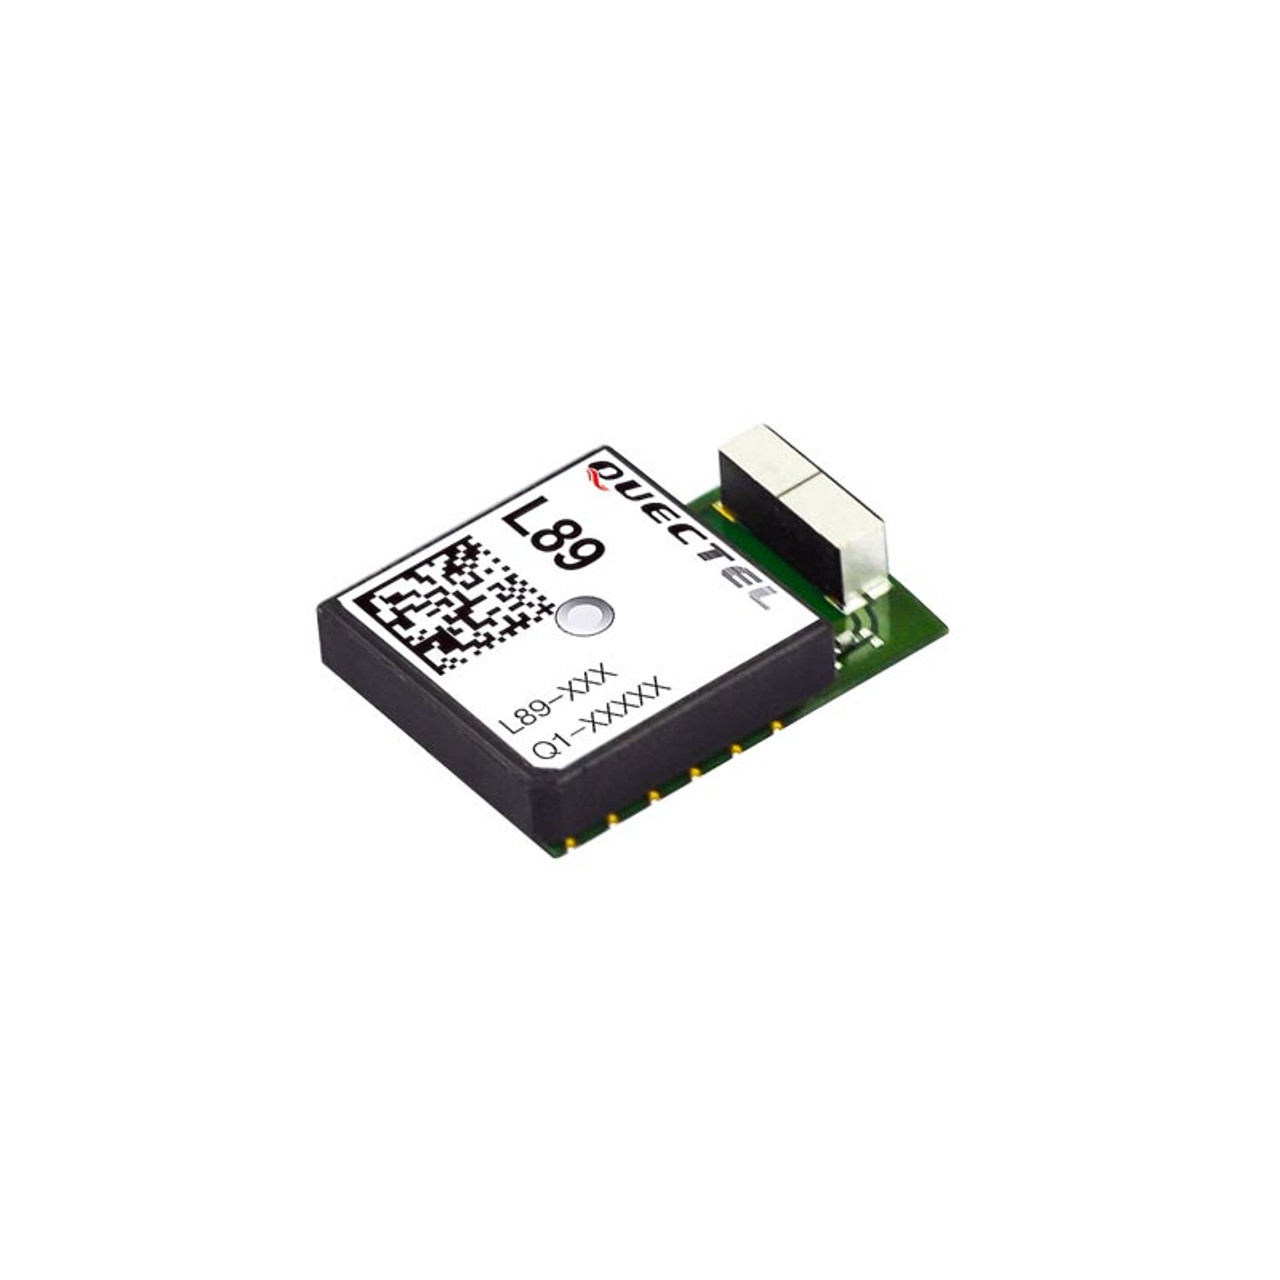 Quectel L89 Compact GNSS Module IRNSS-Enabled